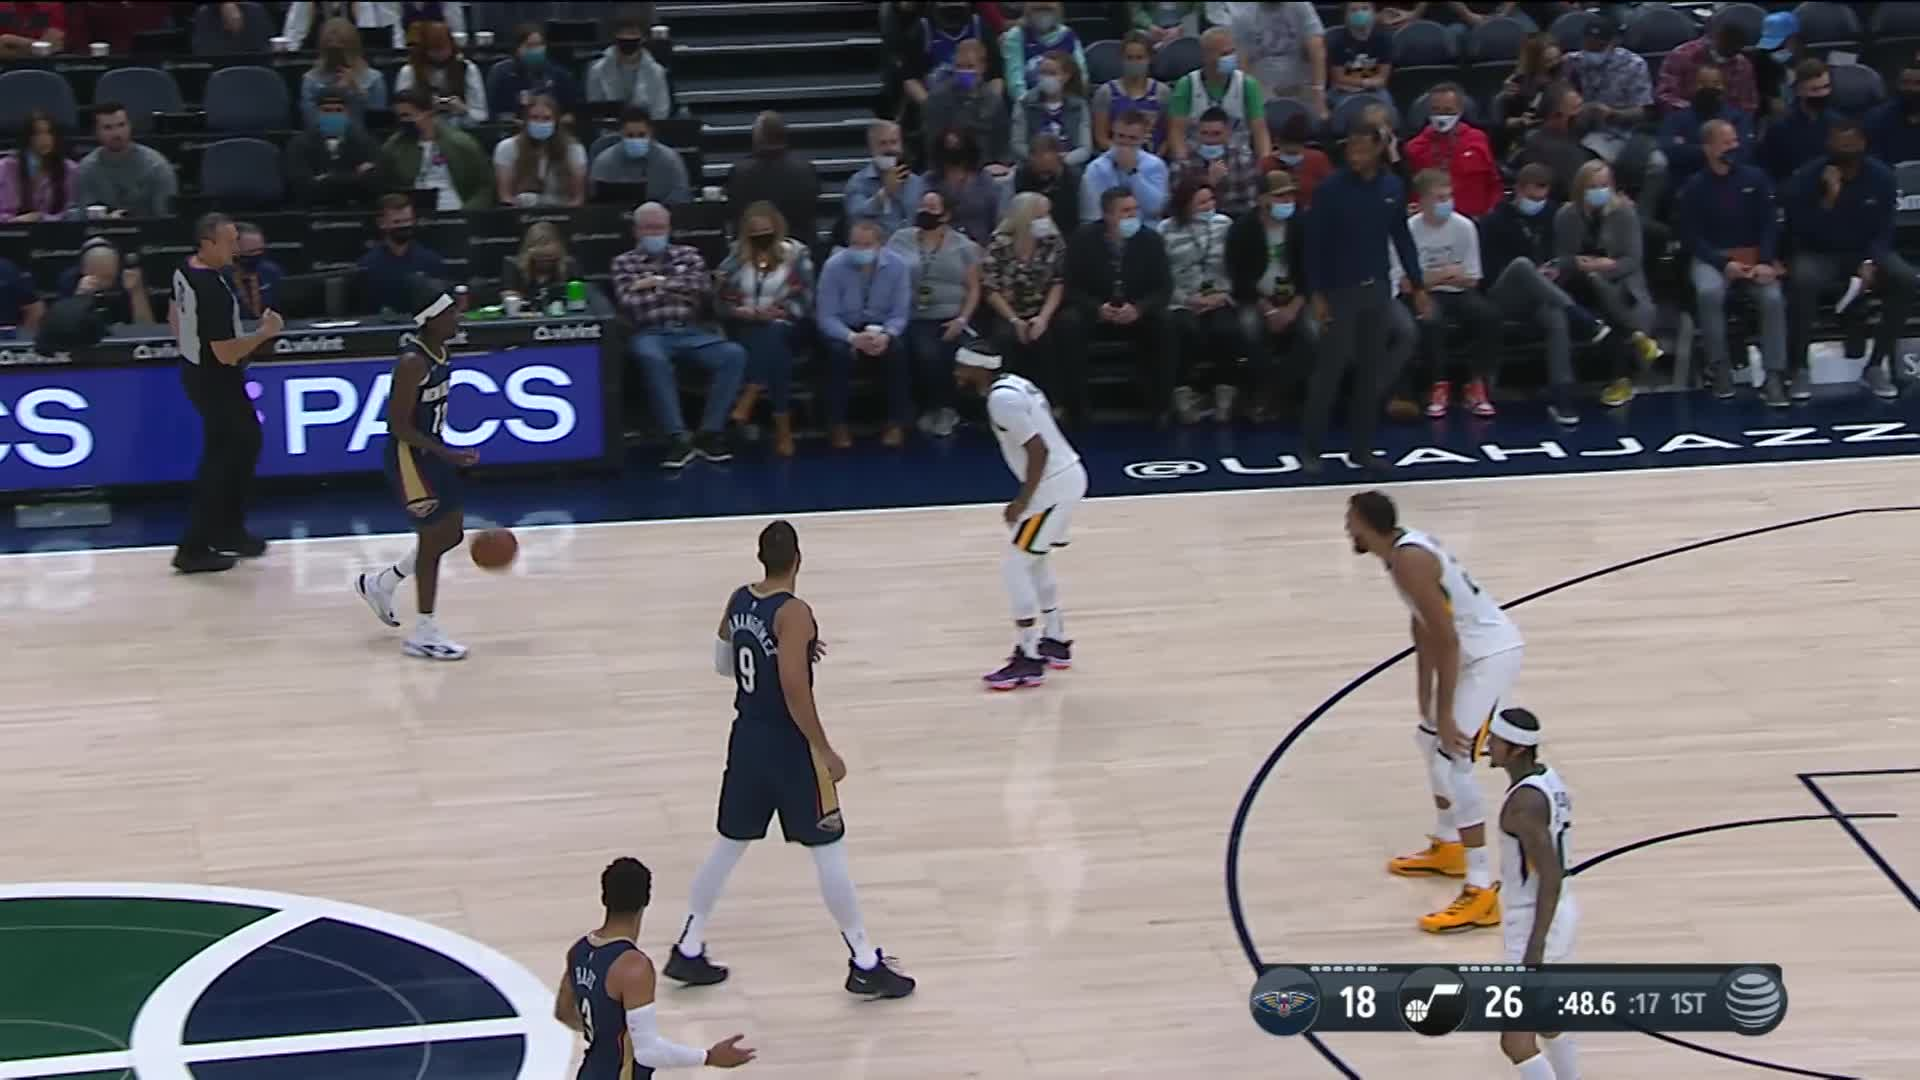 2-pointer by Nickeil Alexander-Walker | Pelicans Preseason: Pelicans at Jazz 10-11-21